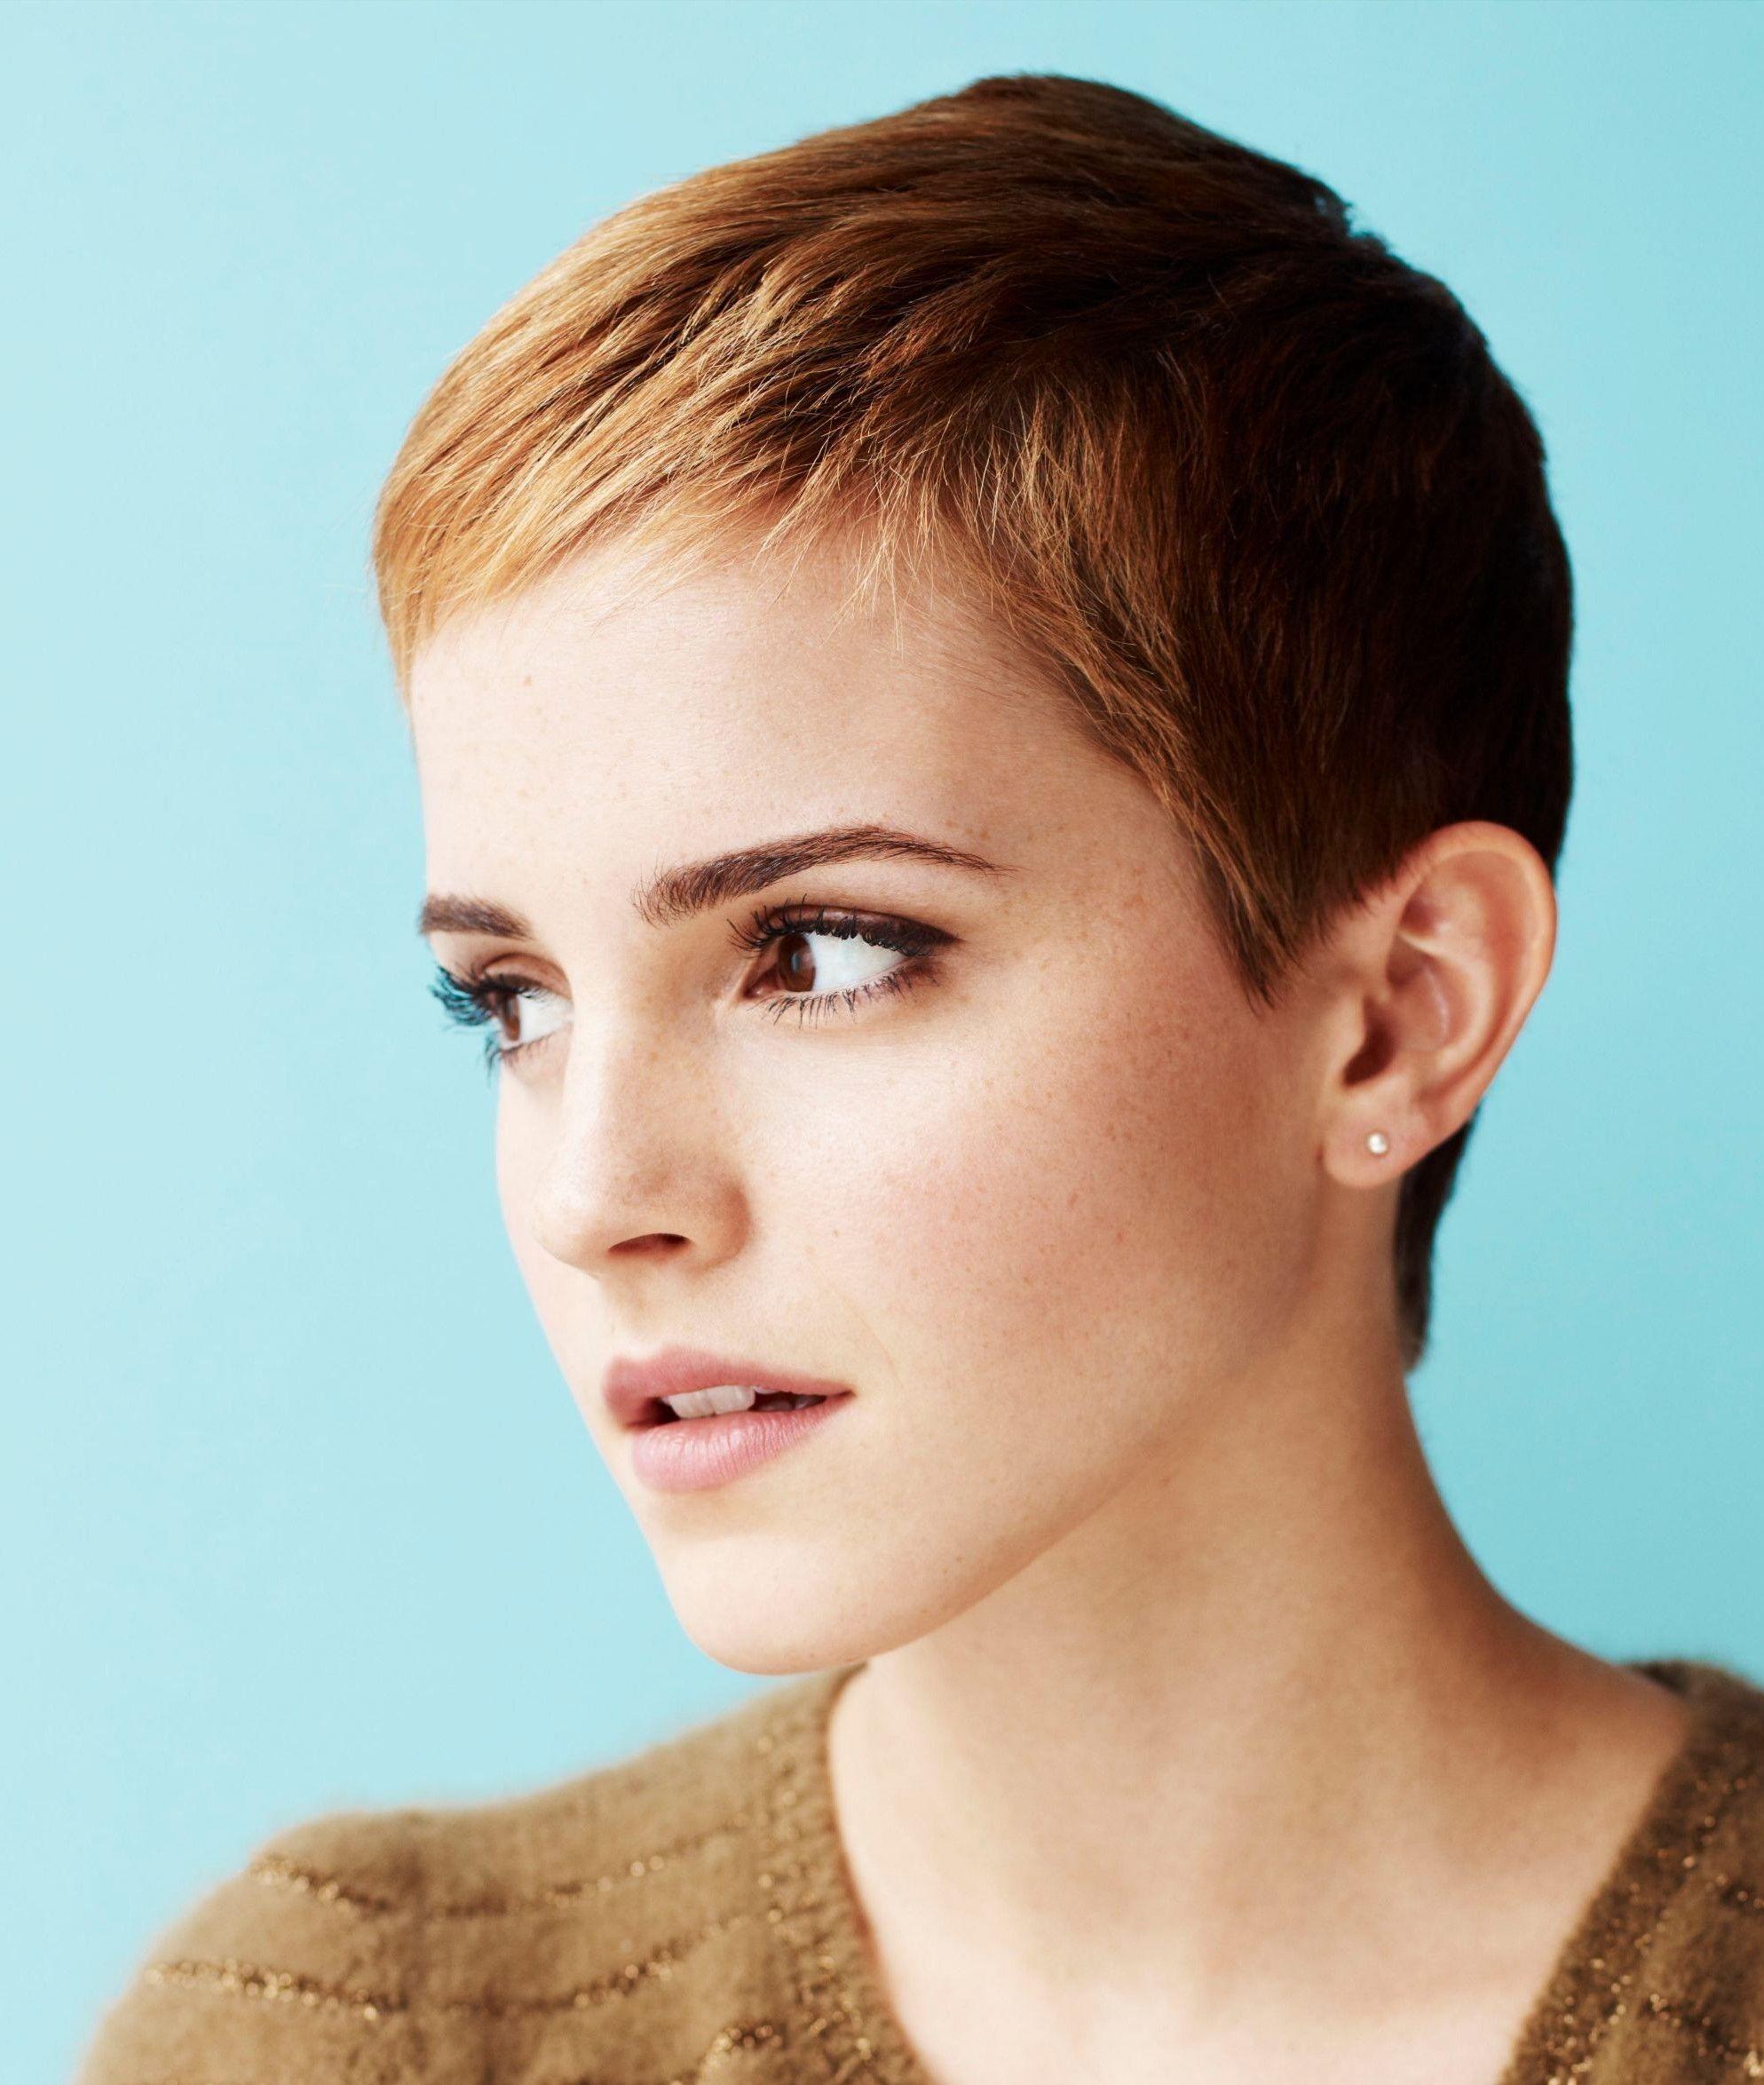 Pin By Annie U On Hair Stuff In 2020 Emma Watson Hair Short Hair Styles Pixie Emma Watson Pixie